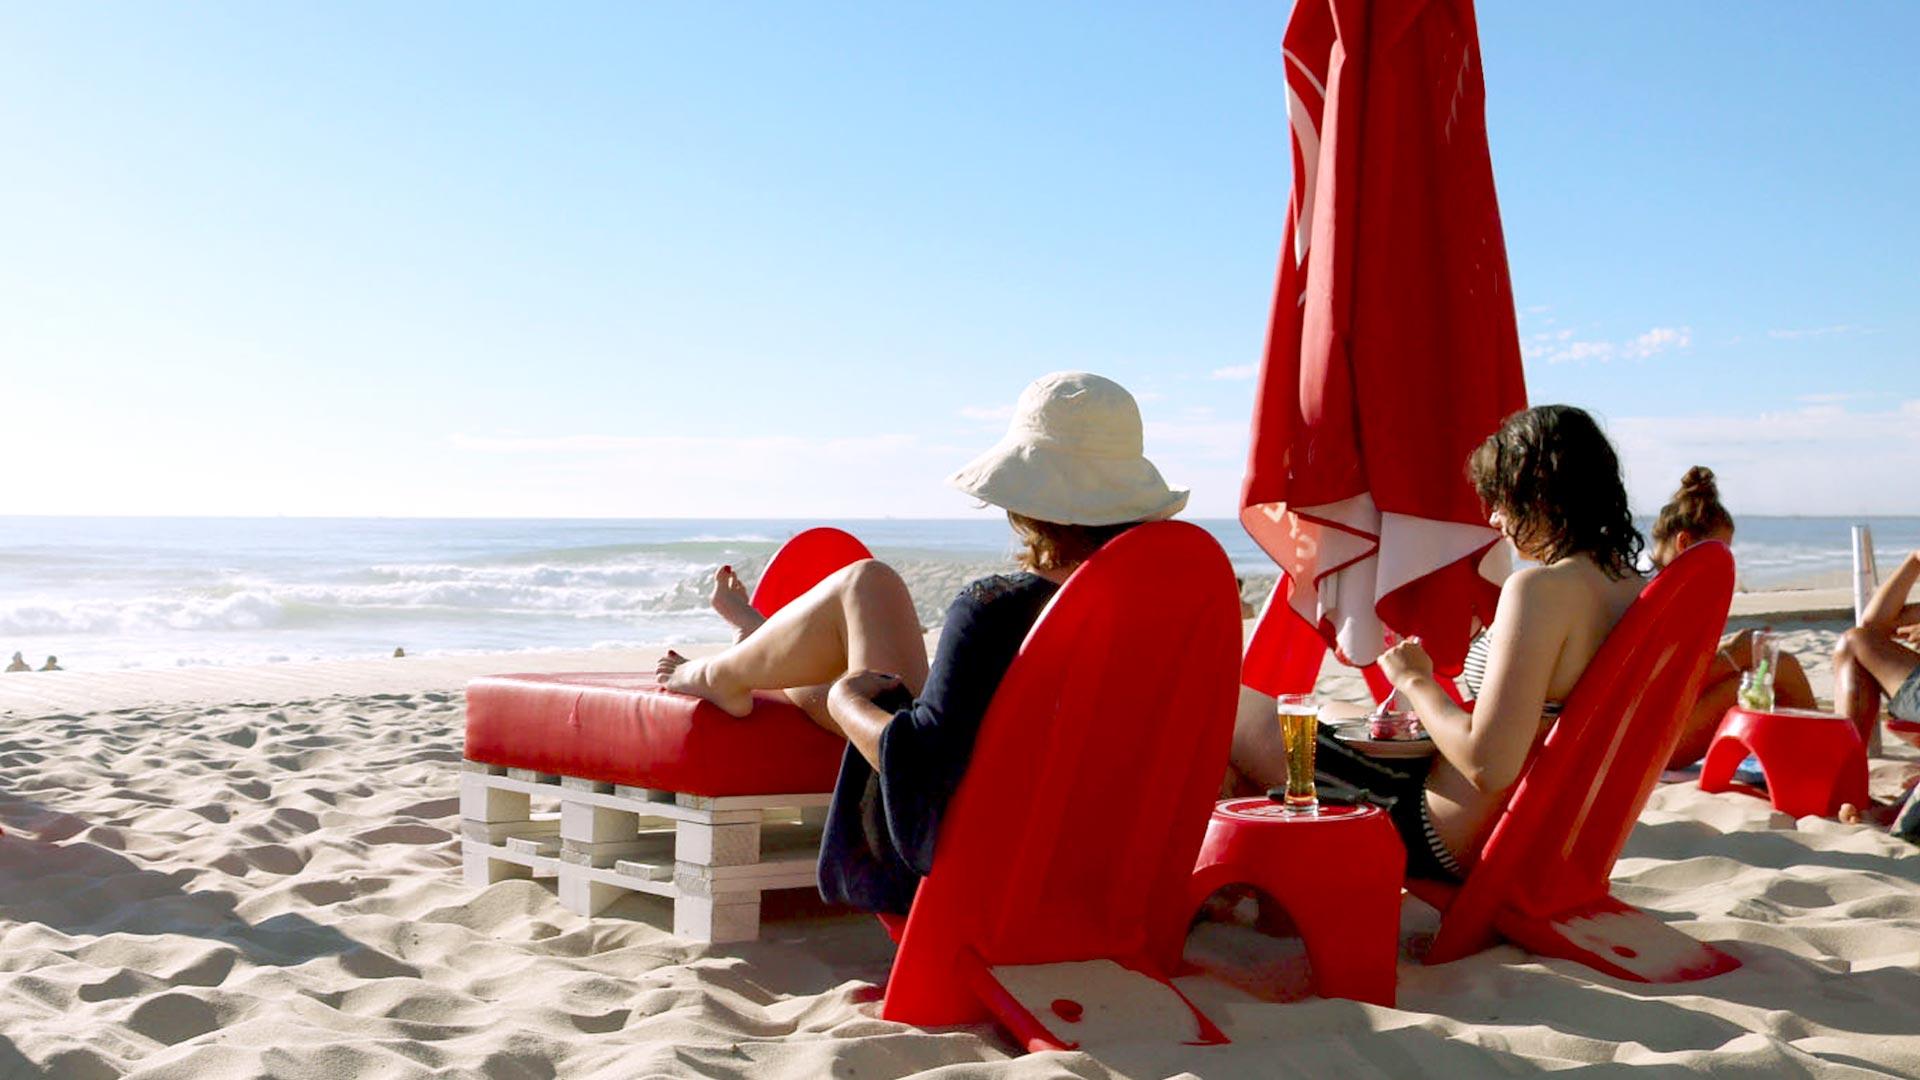 ilhavo-gafanha-da-encarnacao-praia-da-barra-Aveiro-ville-real-estate-imobiliaria-comprar-arrendar-vender-moradia-apartamento-casa-t0-t1-t2-t3-t4-5